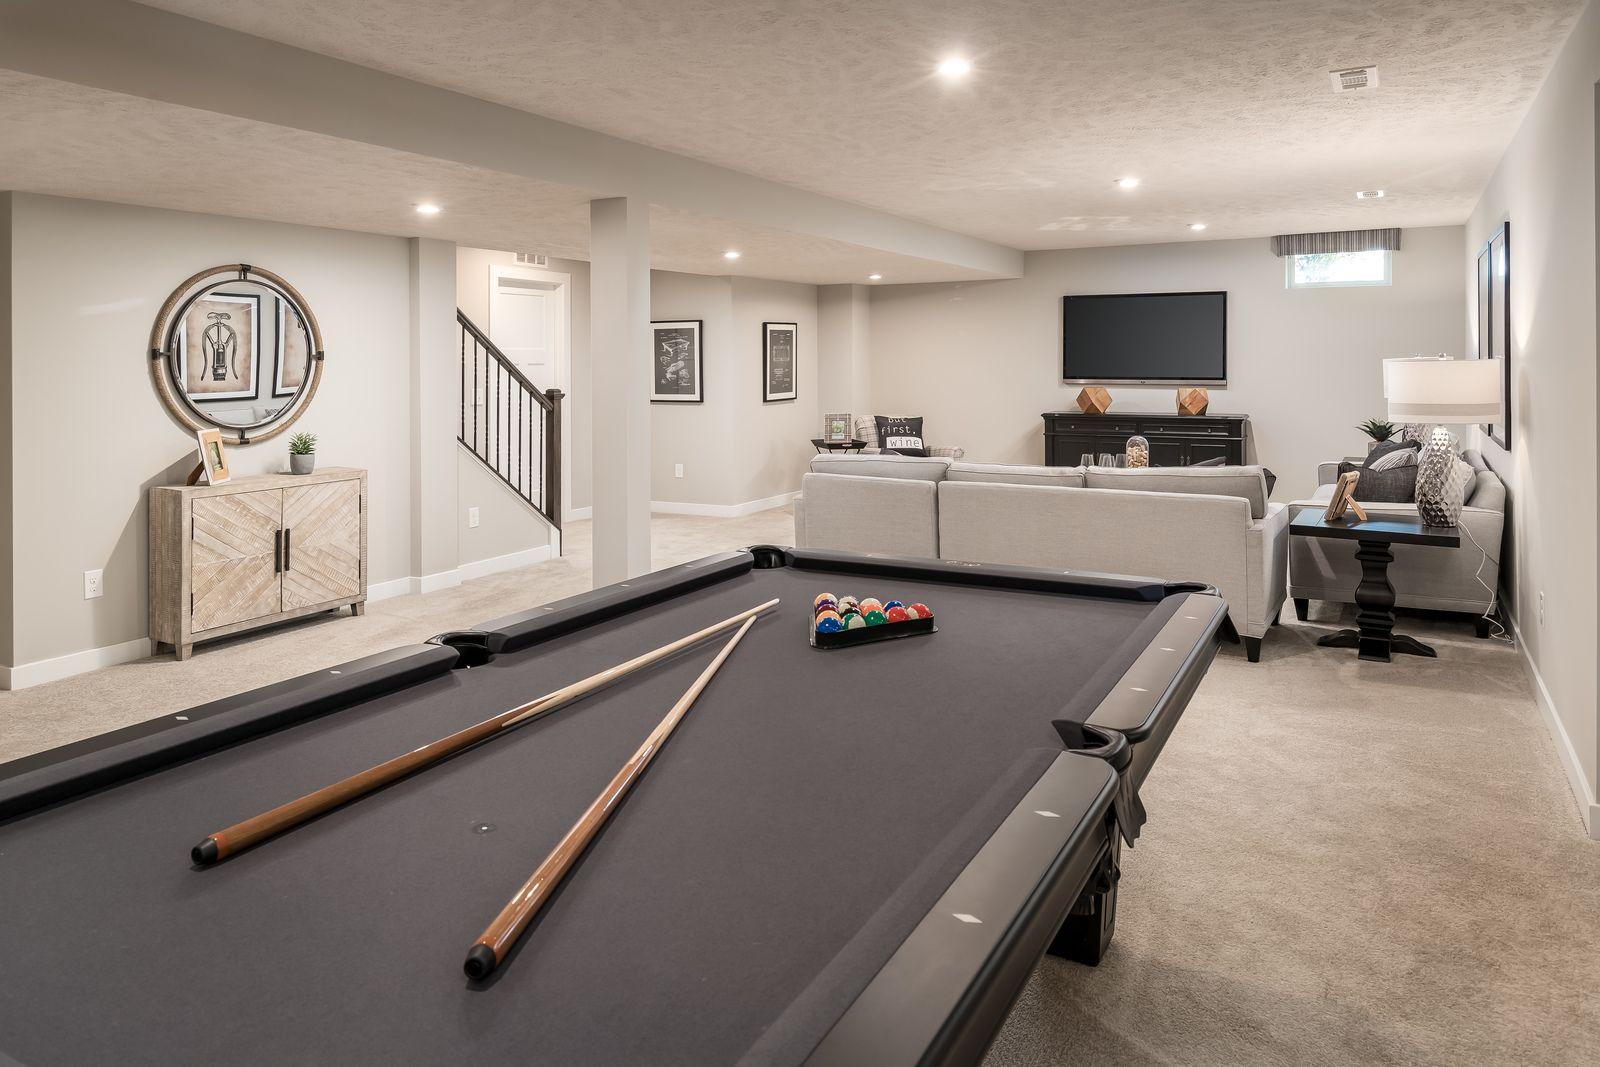 Living Area featured in the Bateman By HeartlandHomes in Morgantown, WV